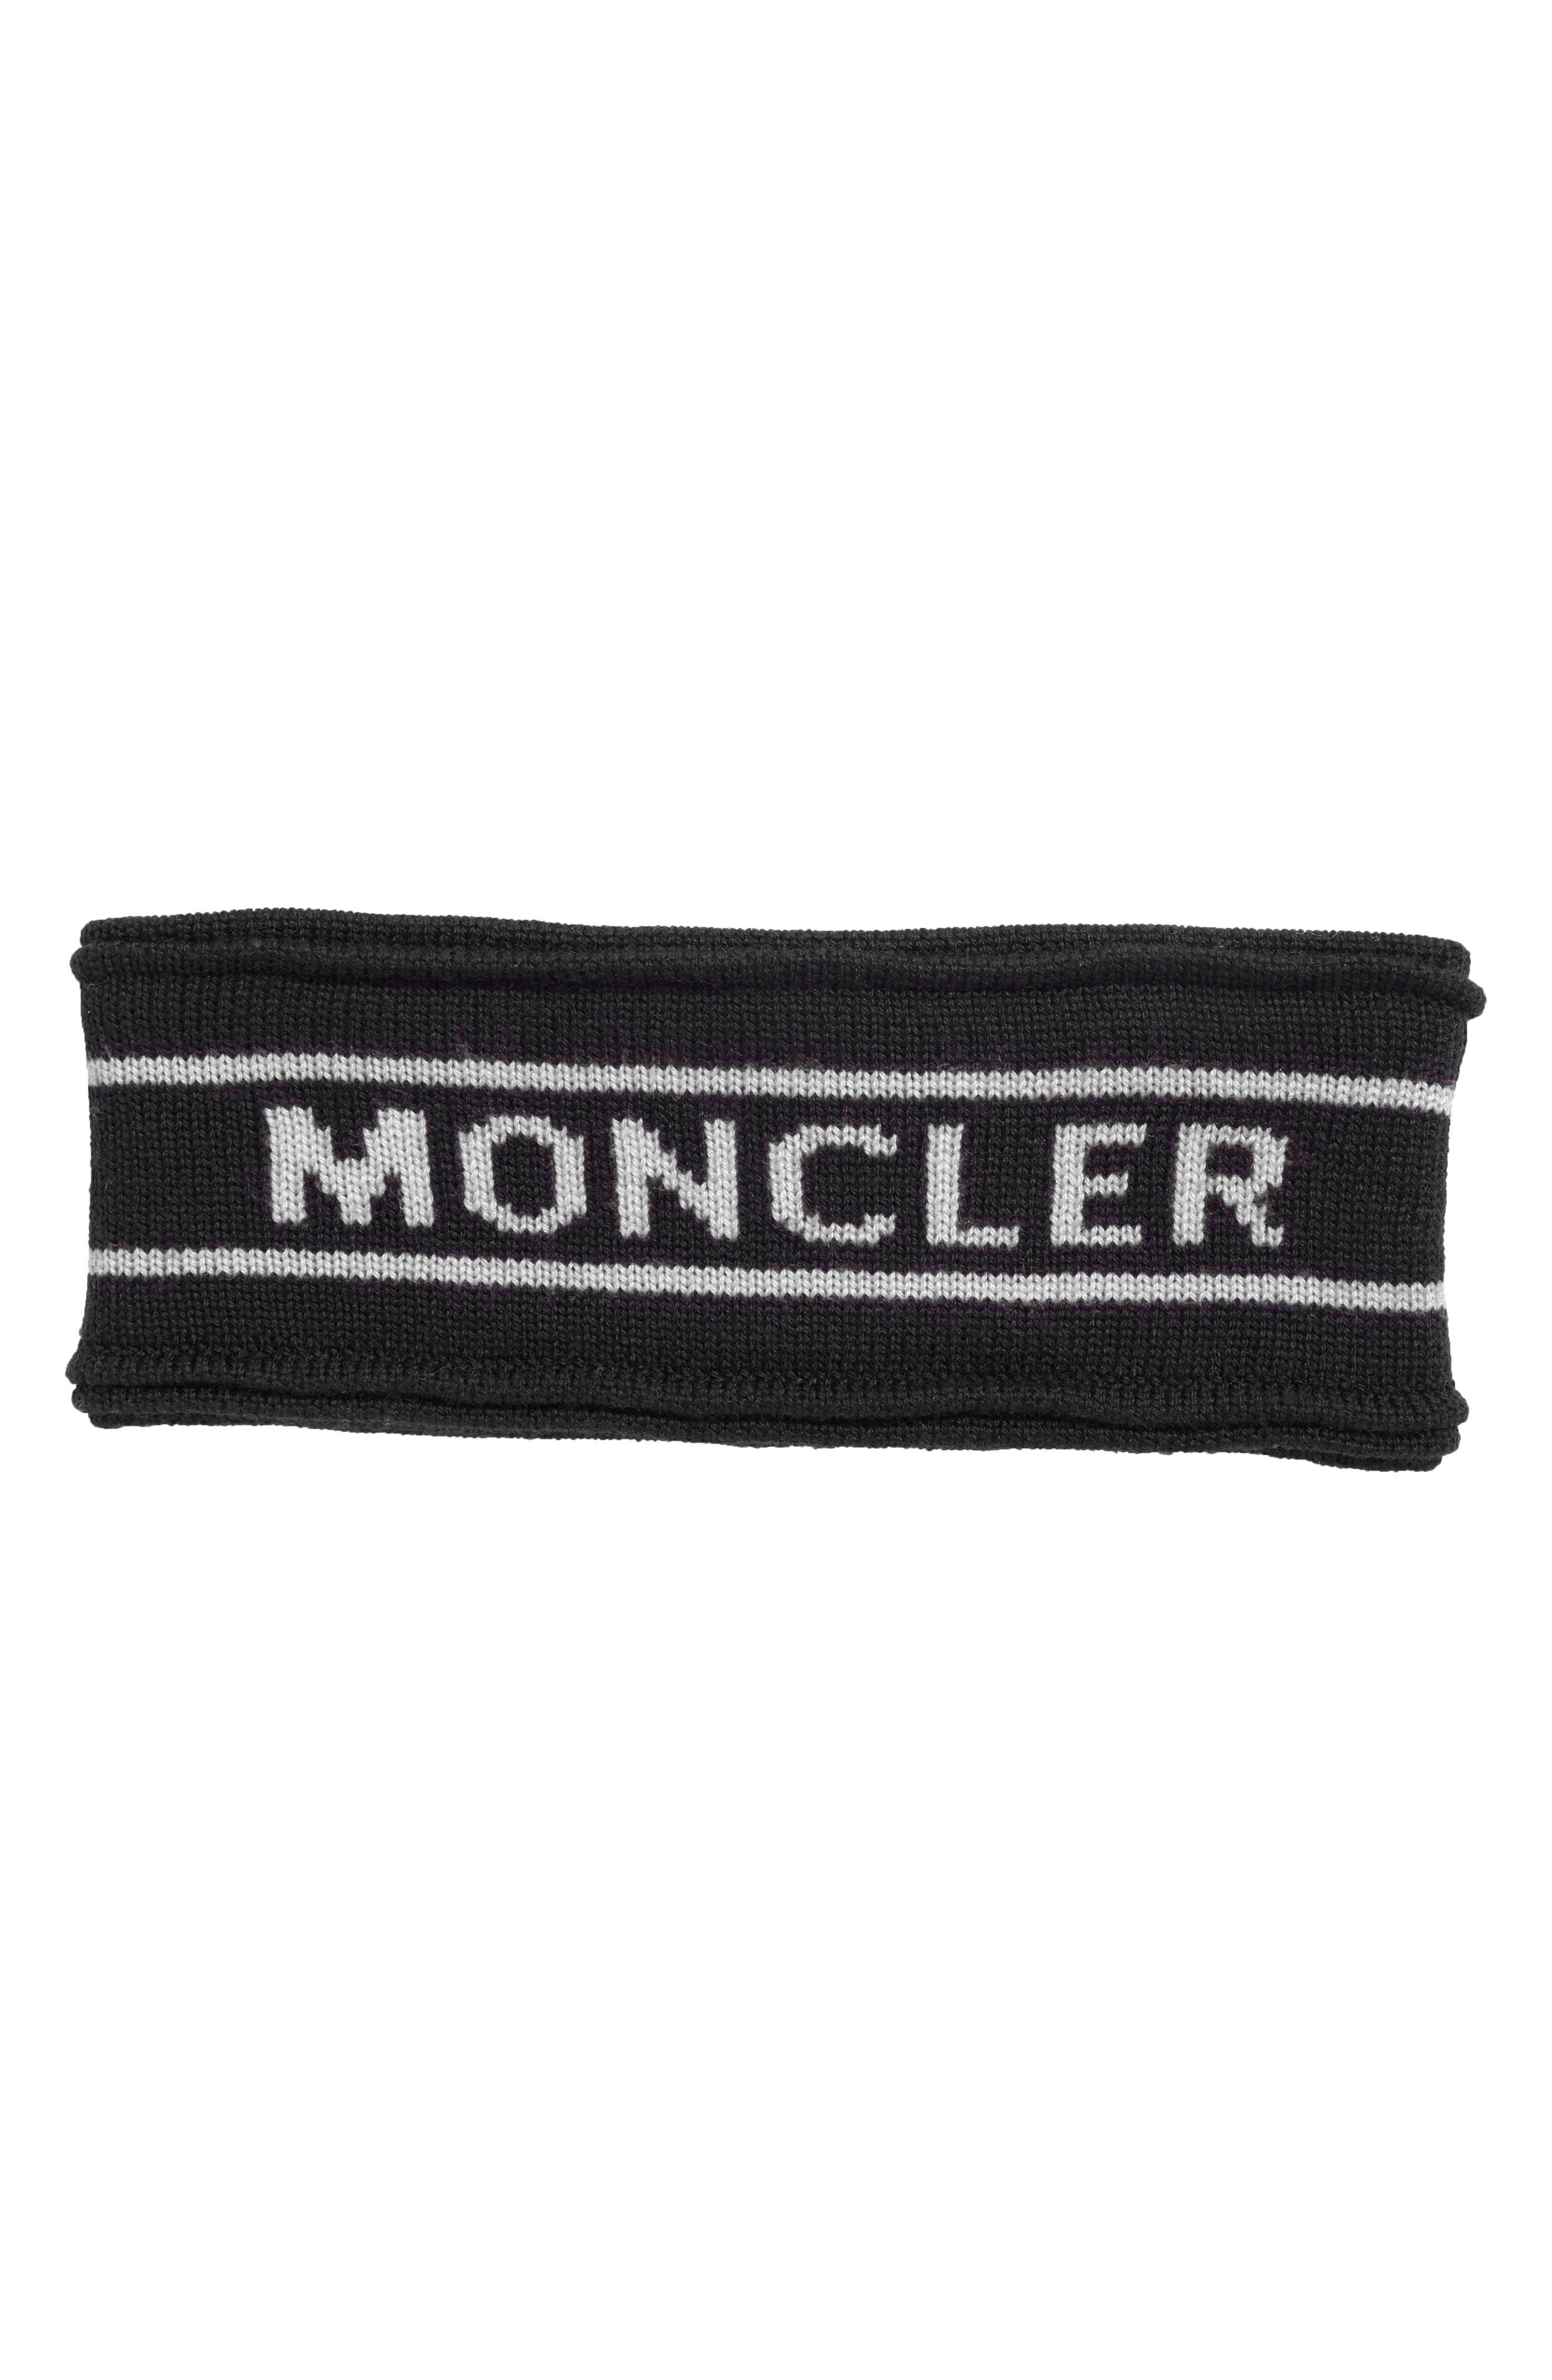 Wool Headband,                         Main,                         color, Black